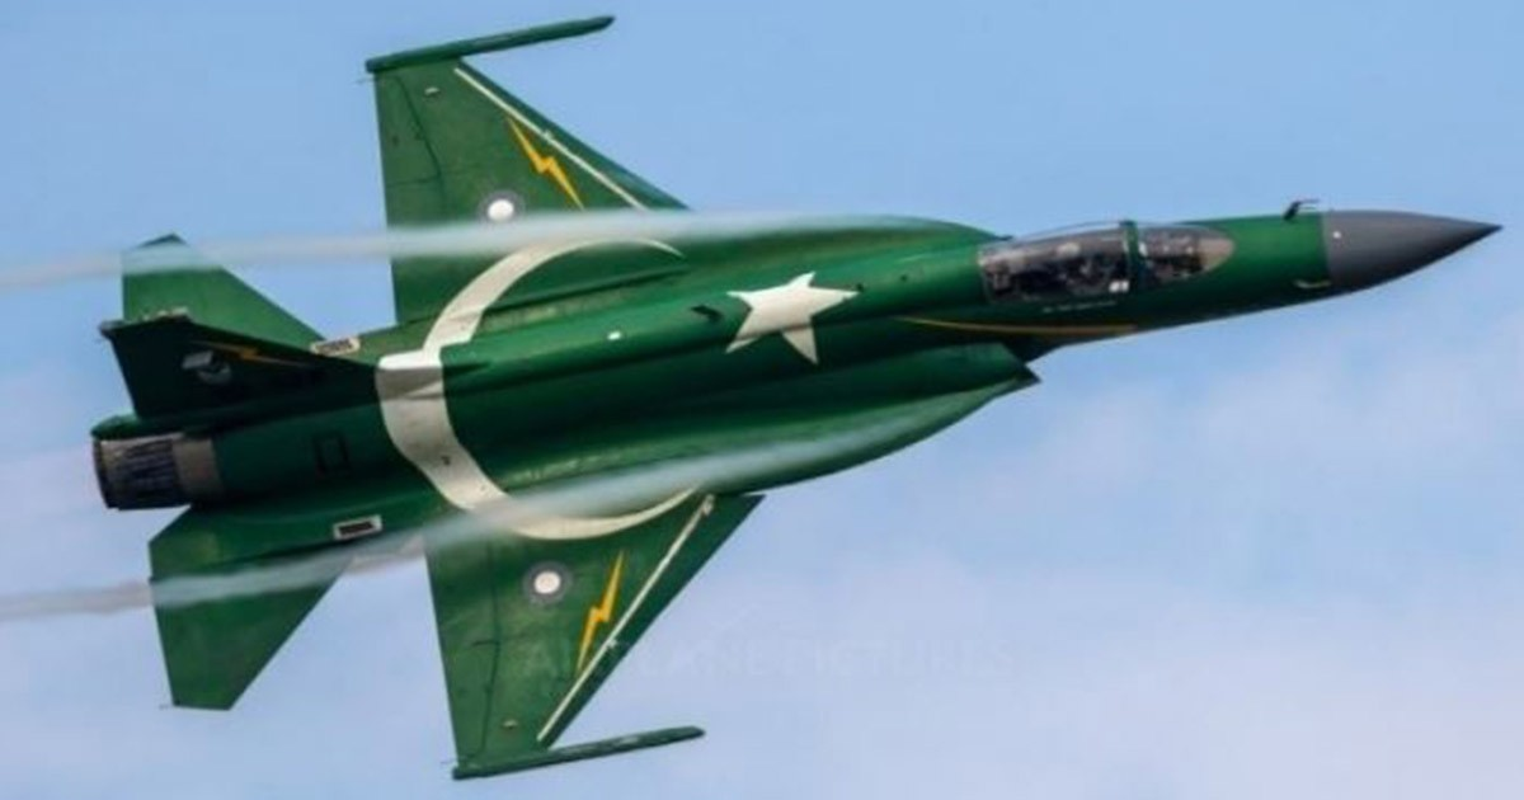 Ly do Malaysia lua chon may bay Pakistan, quay lung voi An Do-Hinh-8